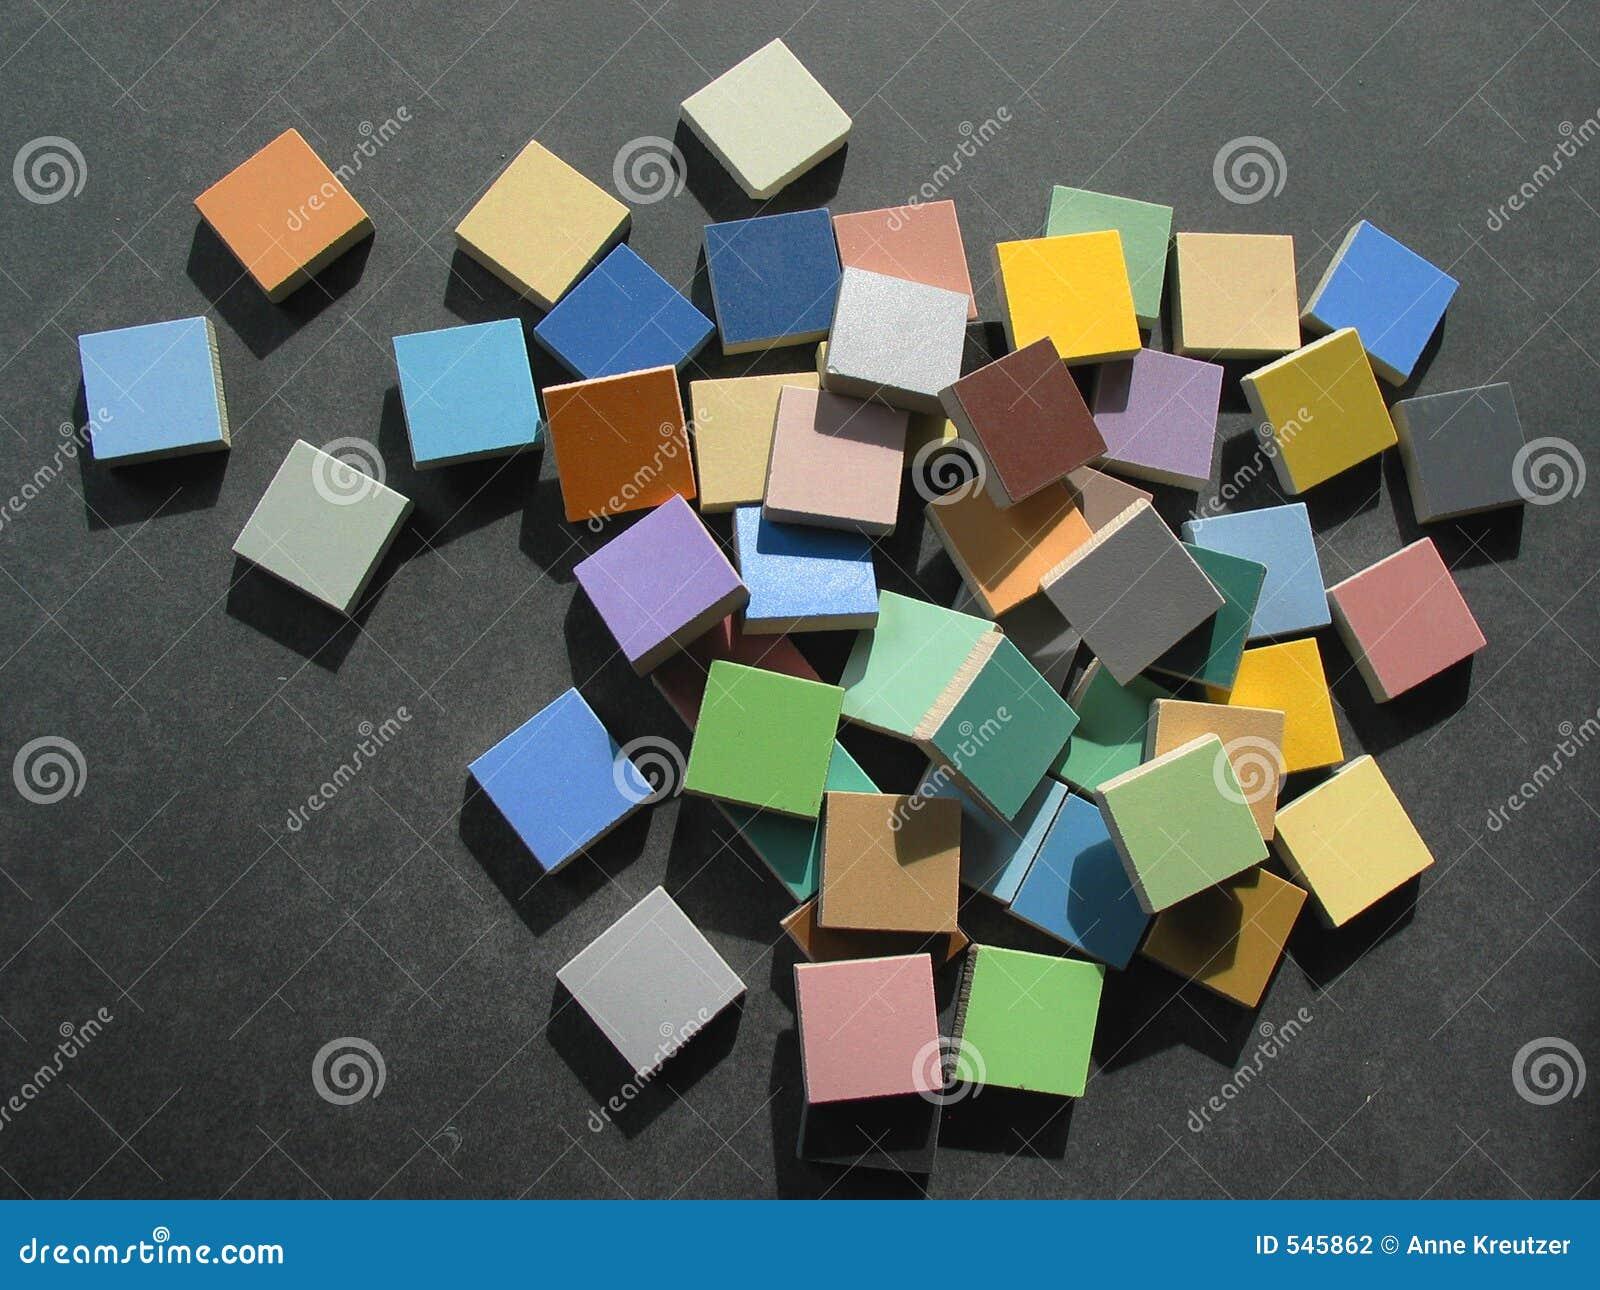 Download 五颜六色的锦砖 库存照片. 图片 包括有 无节制, 马赛克, 盖瓦, 瓦片, 上色, 二次方地, 颜色, 抽象 - 545862